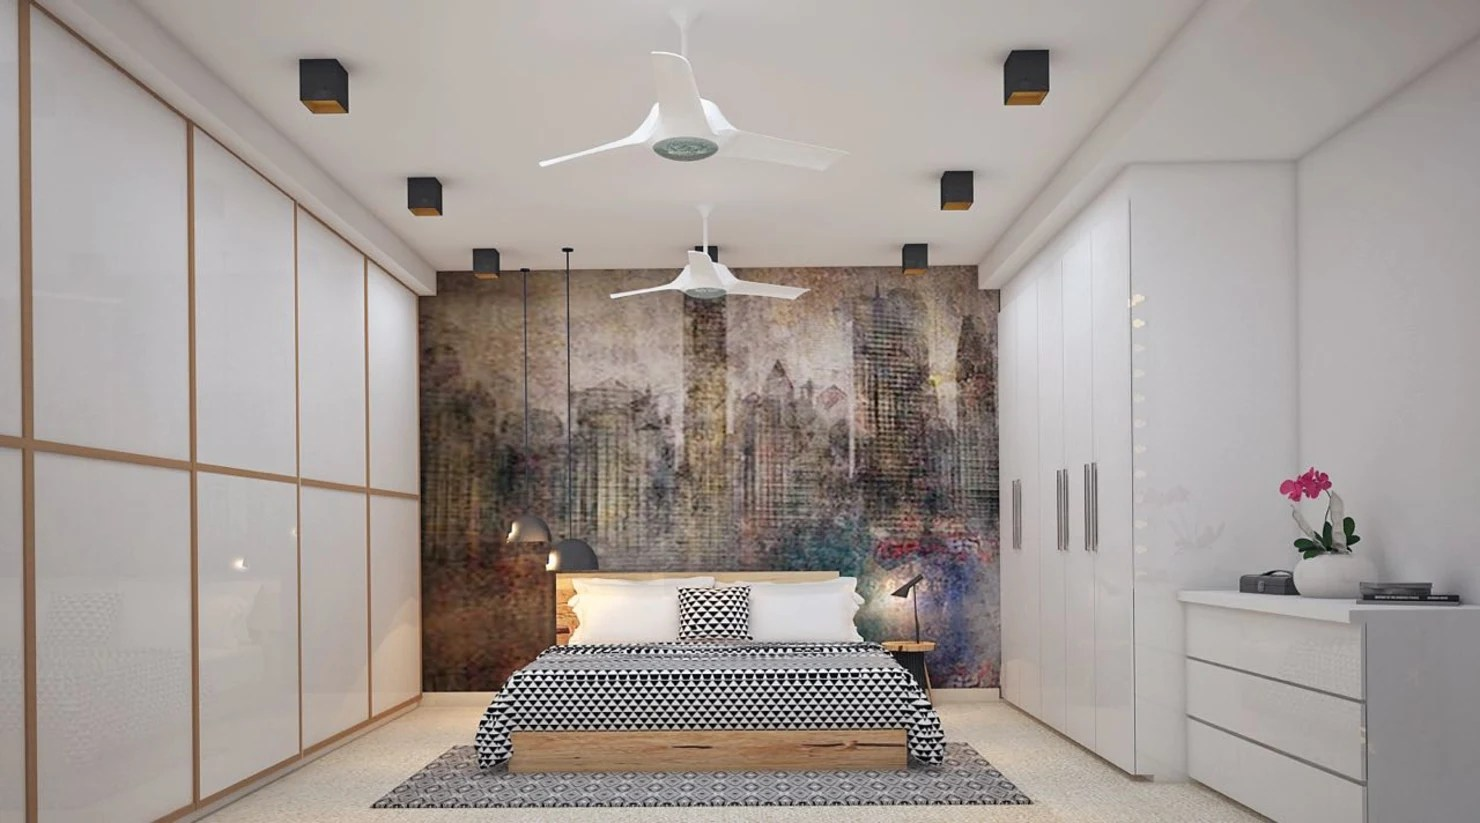 Bedroom Designs From Professionals In Hyderabad